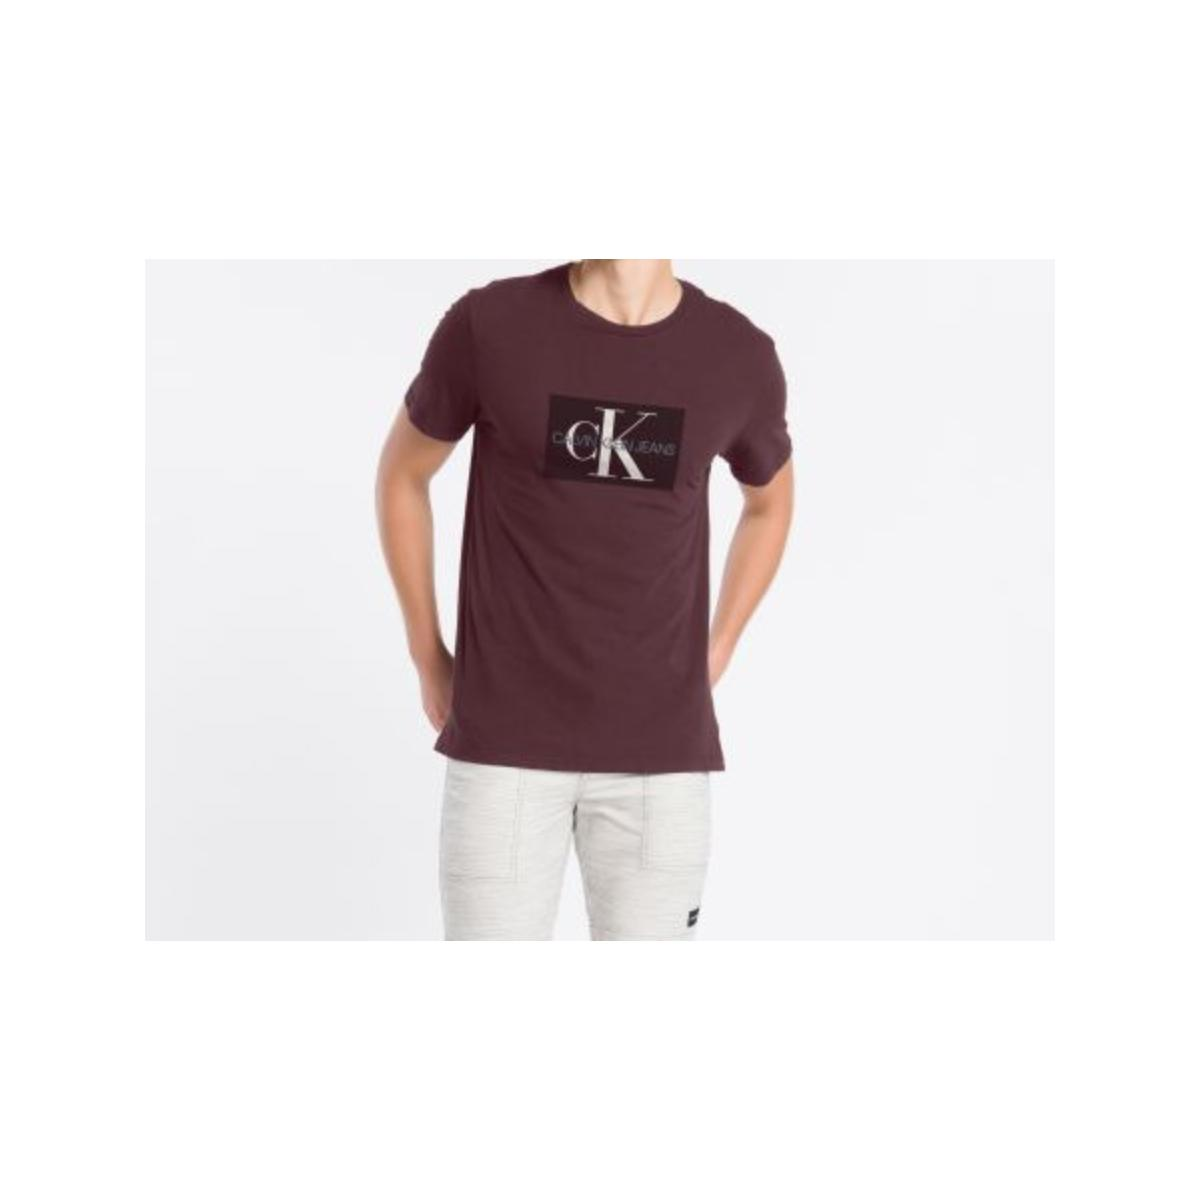 Camiseta Masculina Calvin Klein Cm1oc01i4014 Bordo